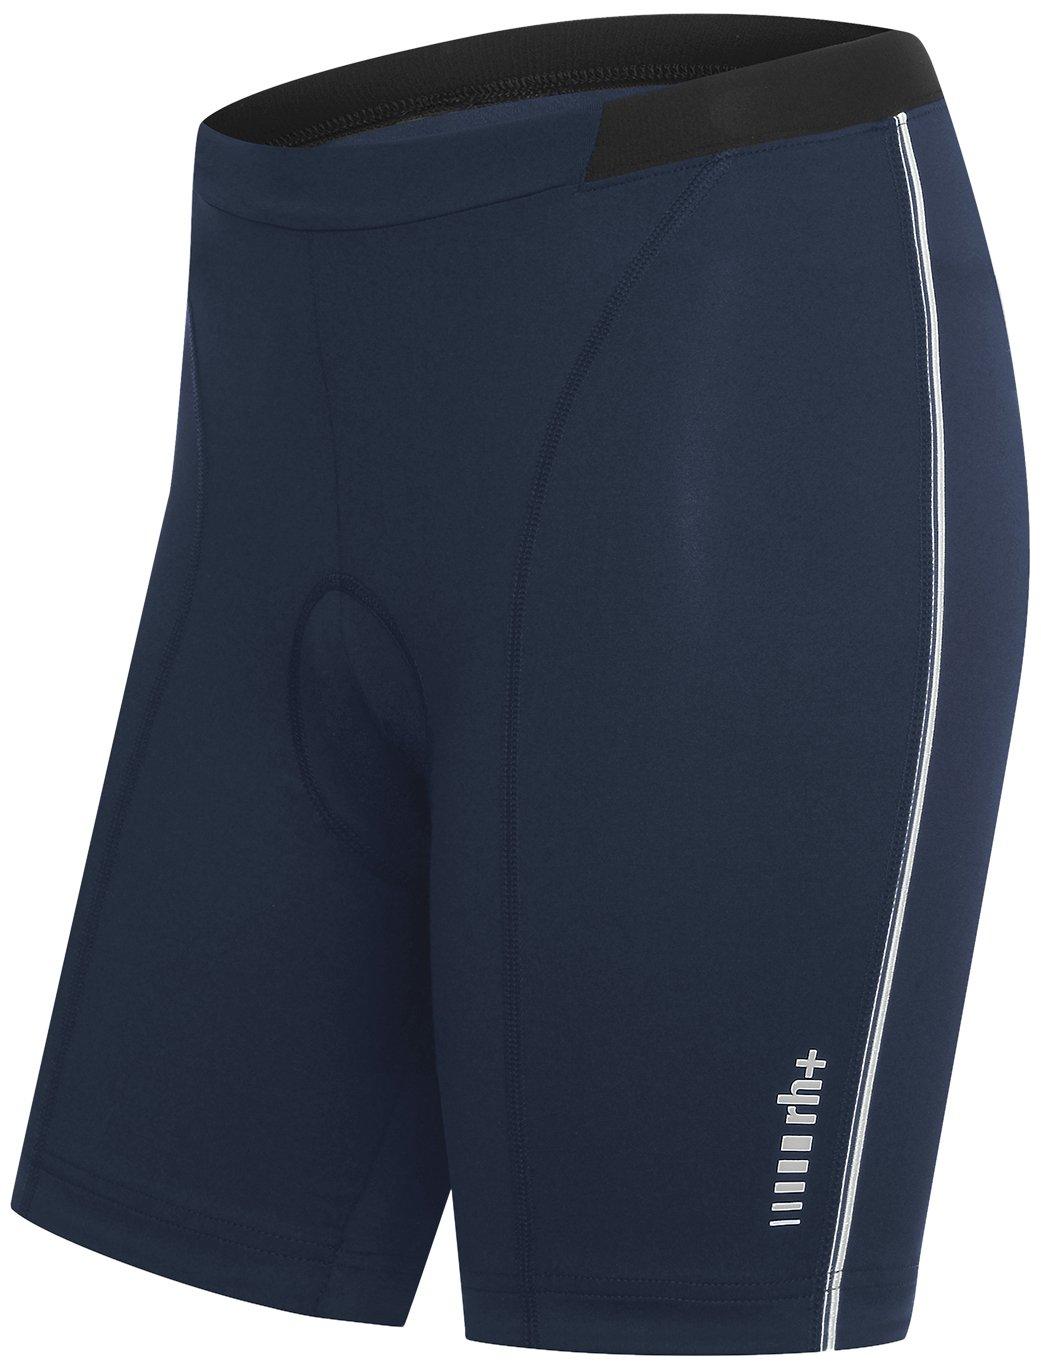 R H Mirage W Shorts Latzhose und Shorts, Damen